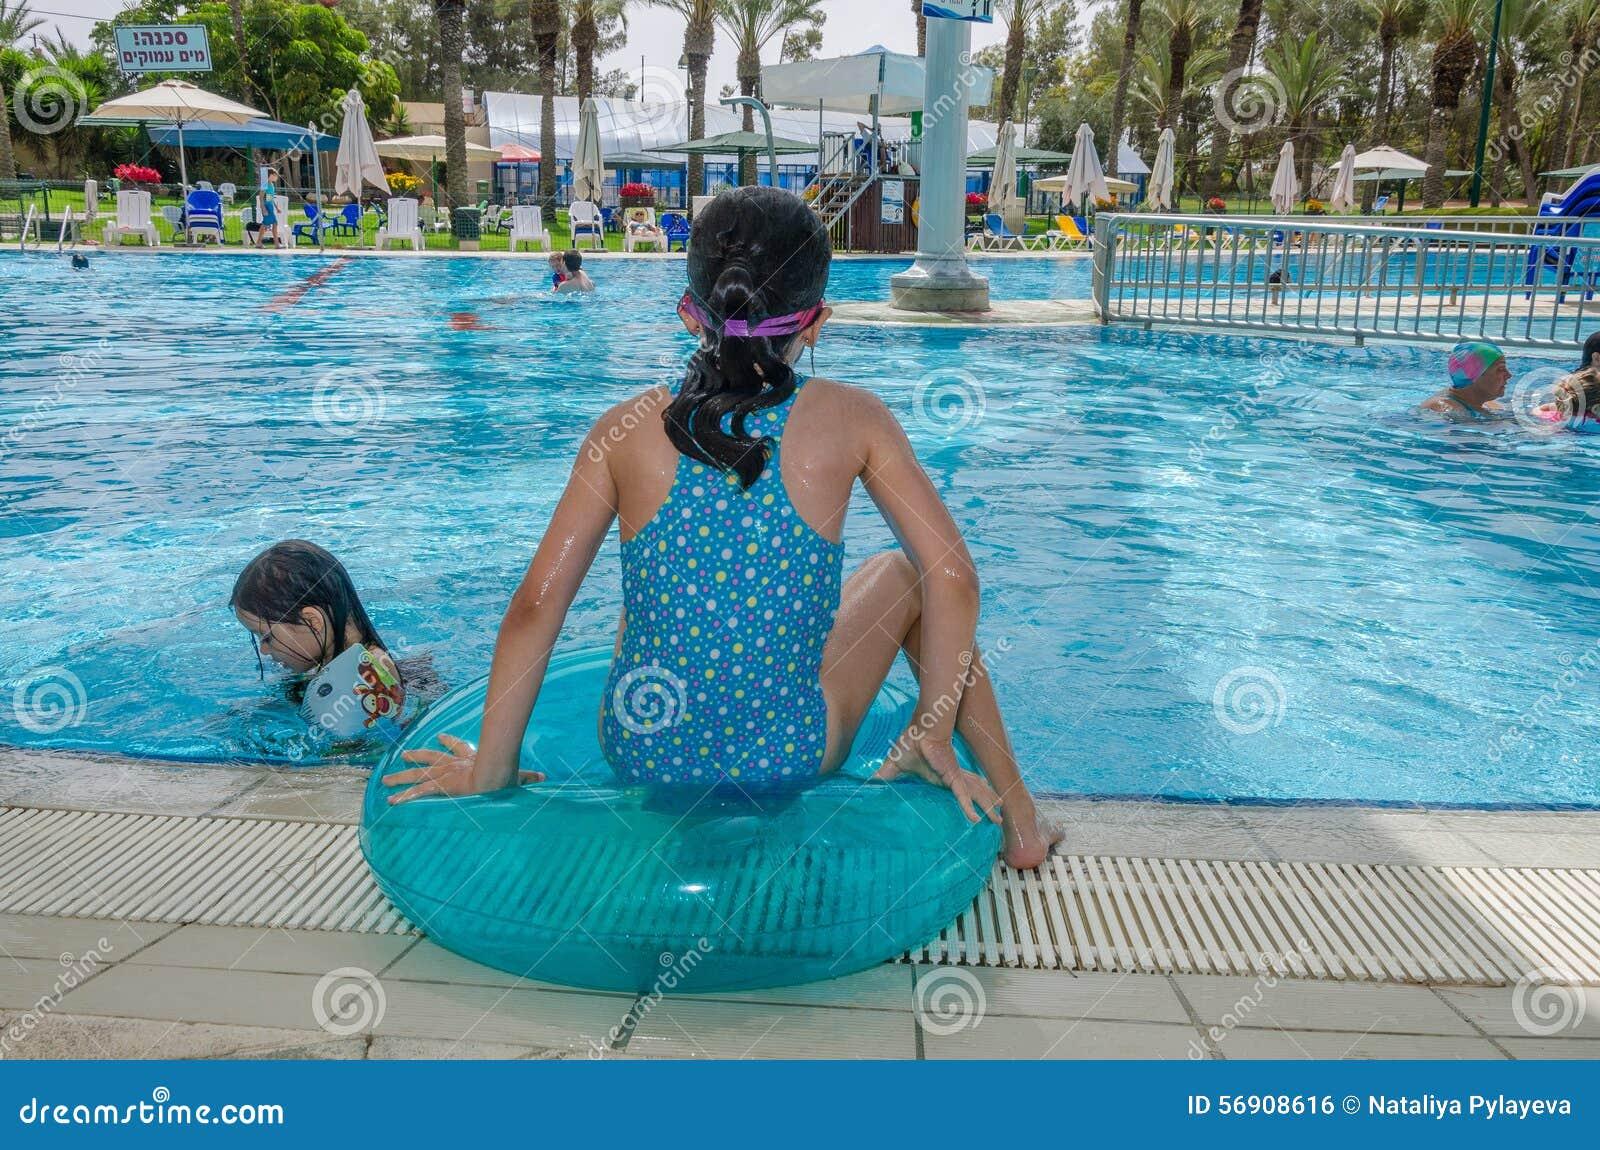 Omer, Negev, ΙΣΡΑΗΛ - 27 Ιουνίου, συνεδρίαση κοριτσιών στη διογκώσιμη πλάτη δαχτυλιδιών, που εξετάζει το νερό στη λίμνη Omer, Neg